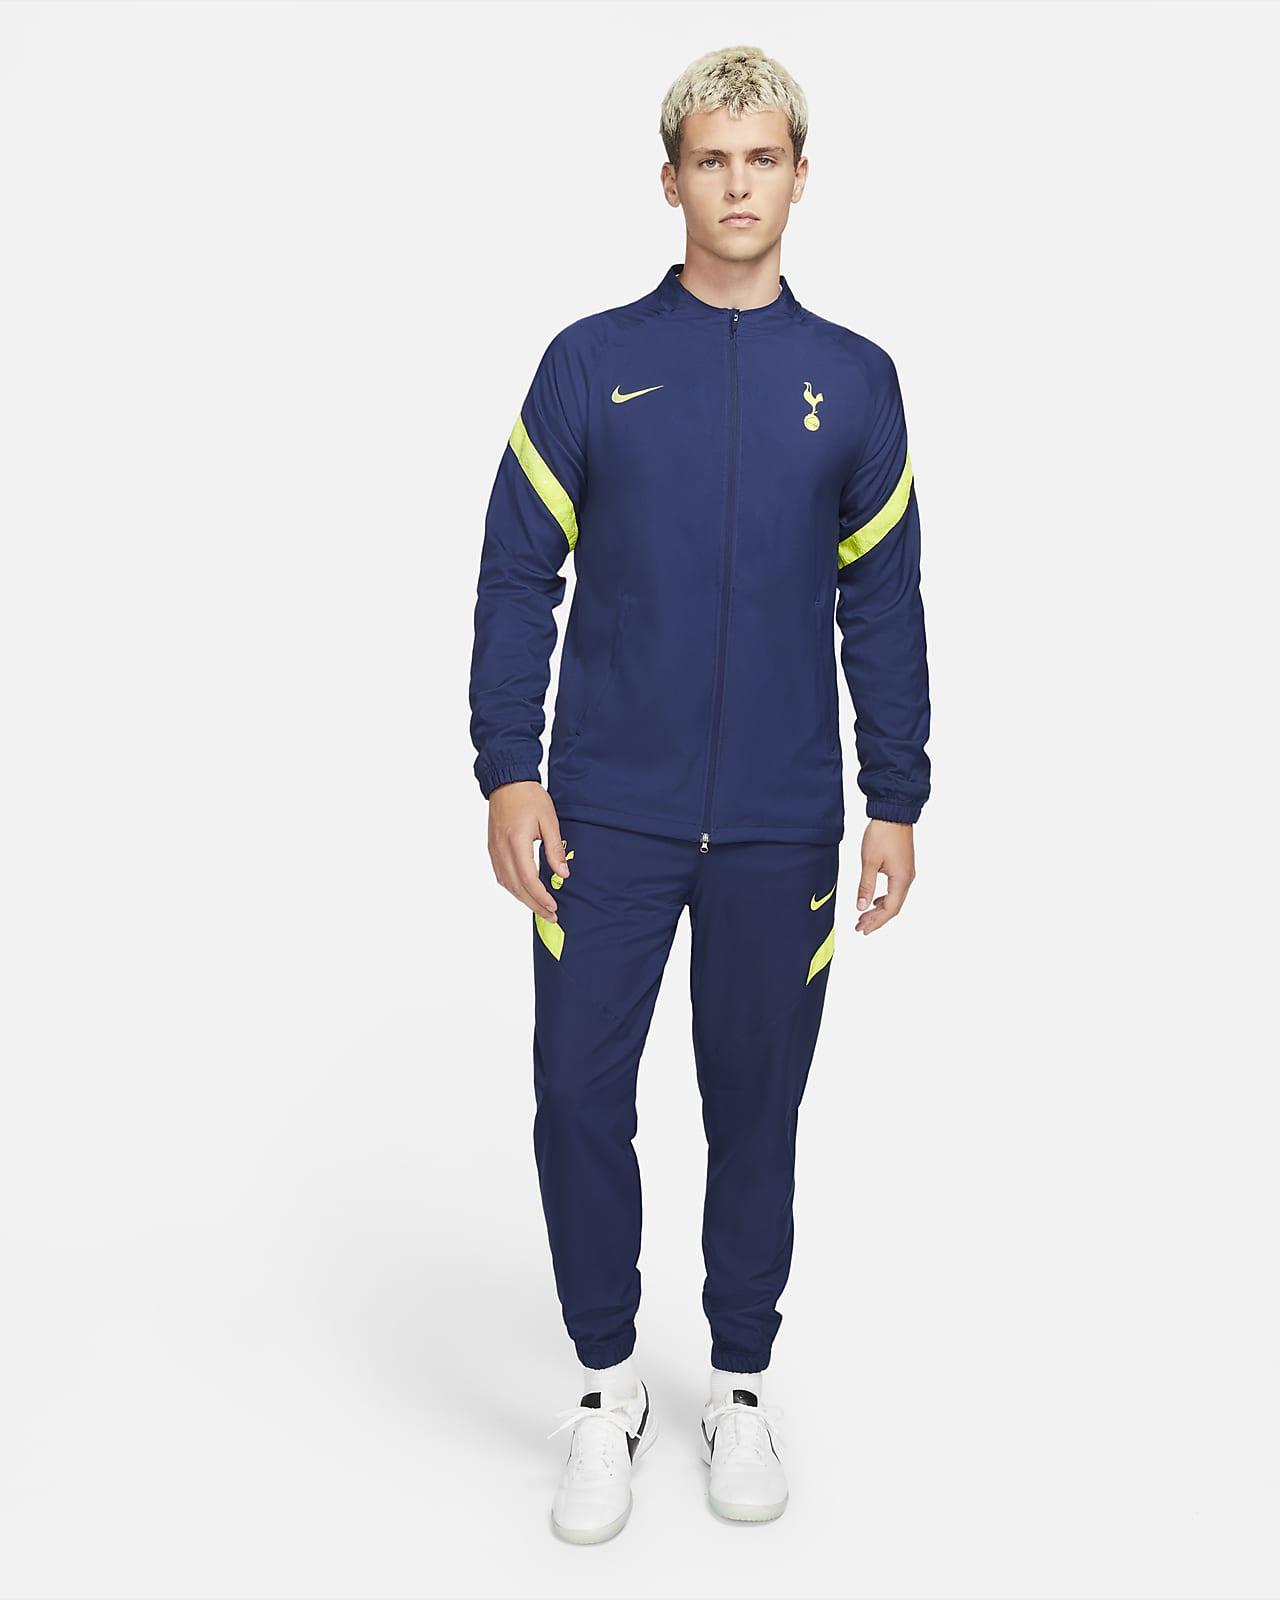 Tottenham Hotspur Strike Xandall Nike Dri-FIT de futbol - Home